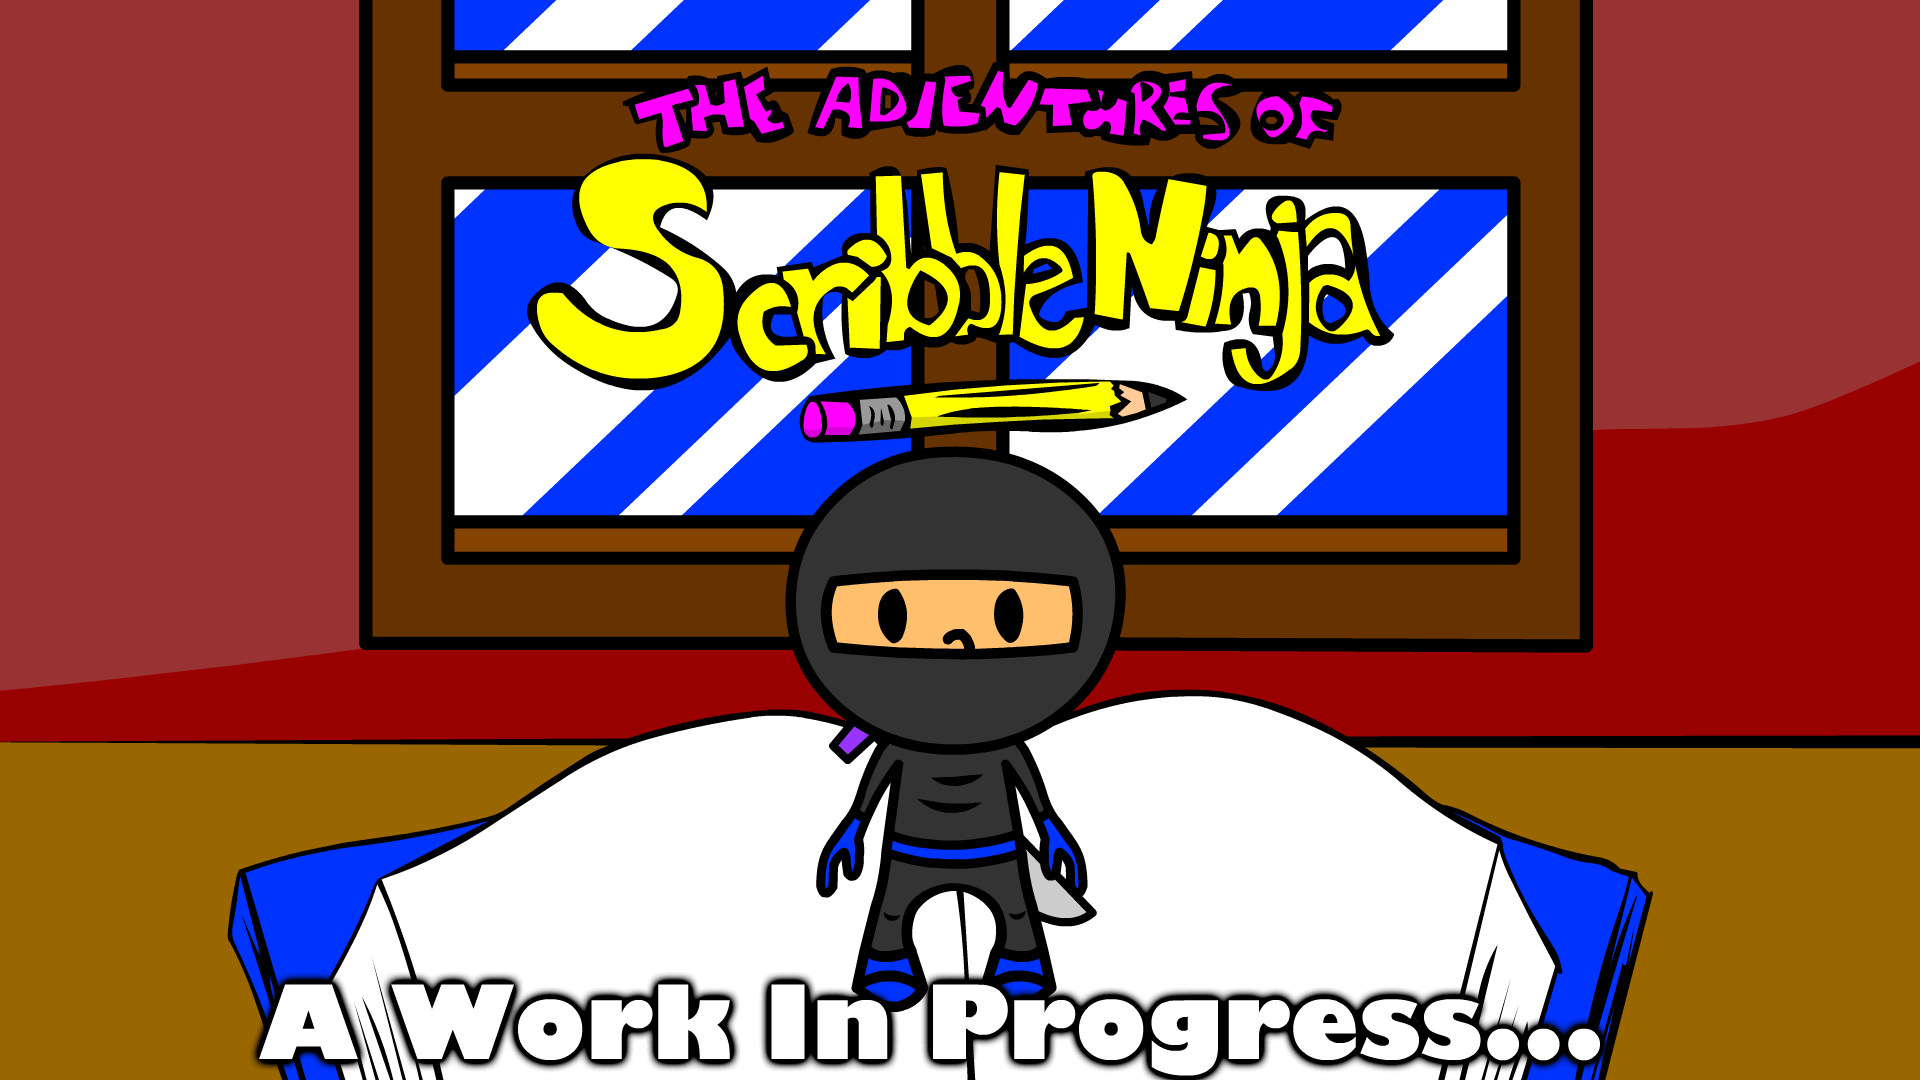 ScribbleNinja Preview Poster